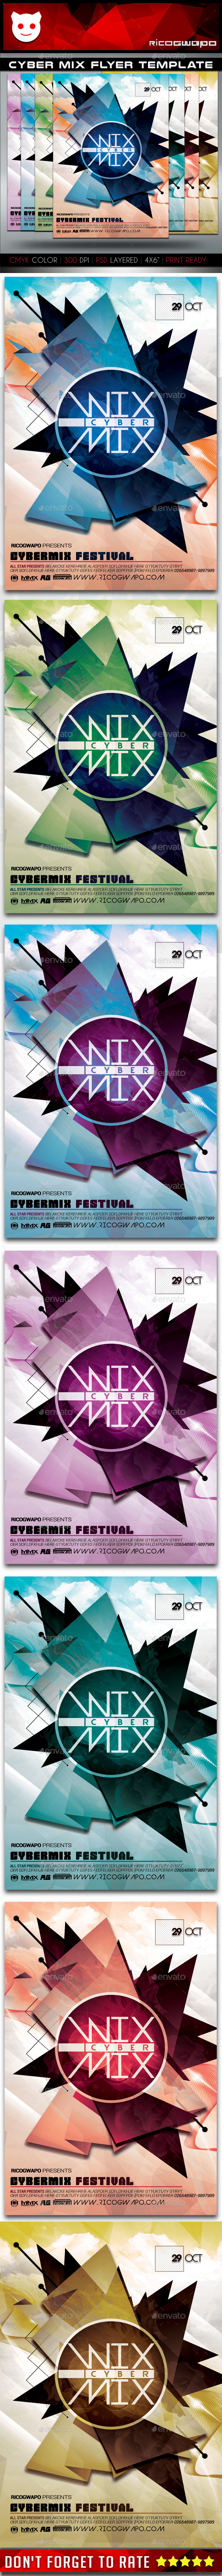 Cyber Mix Flyer Template - Flyers Print Templates